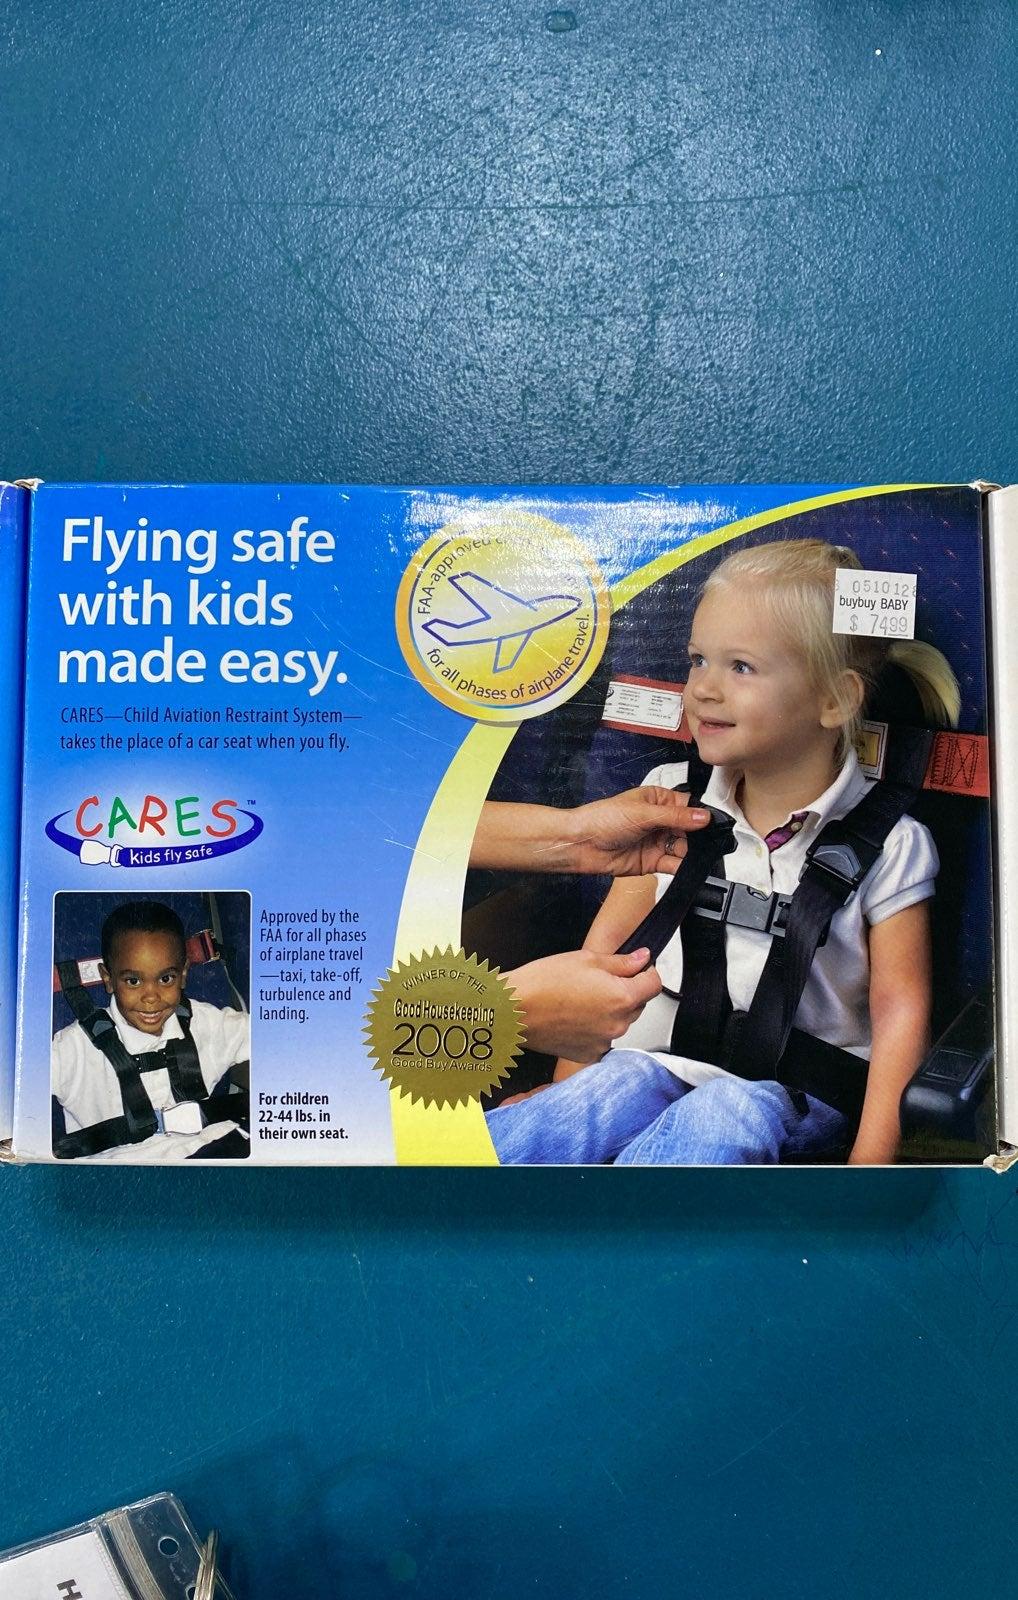 Child Aviation Restraint System